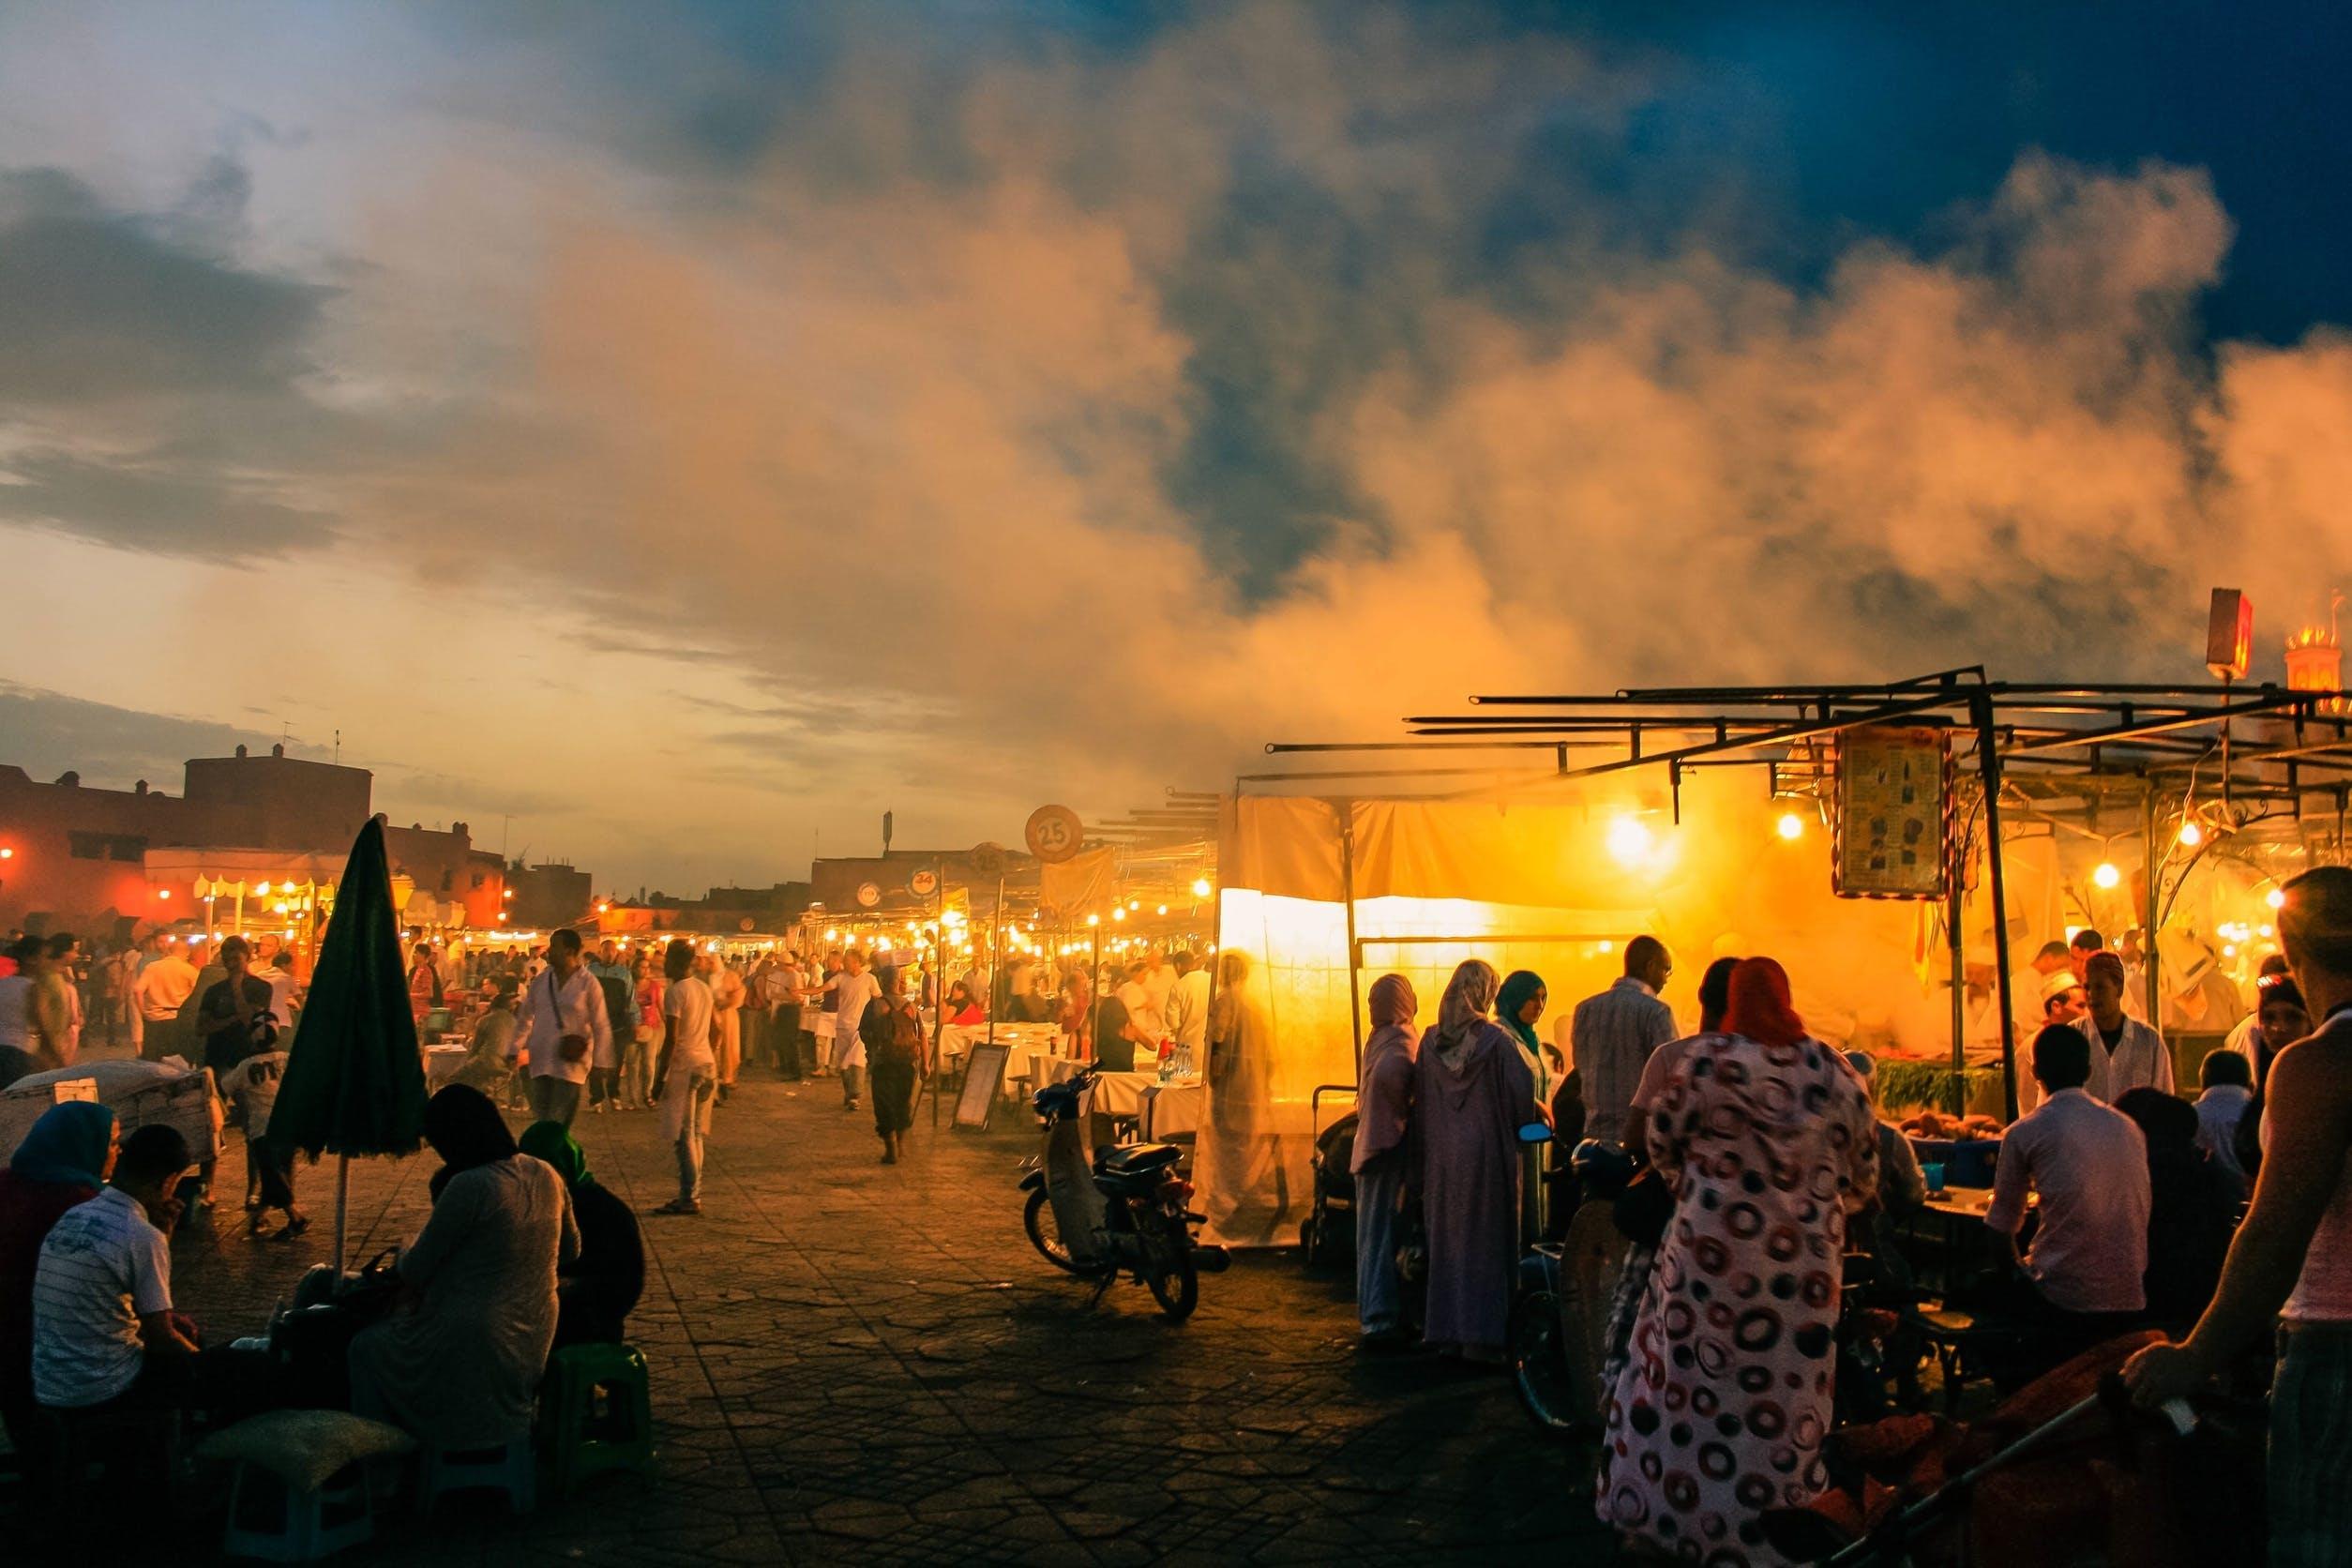 Kostenloses Stock Foto zu basar, beleuchtung, festival, markt